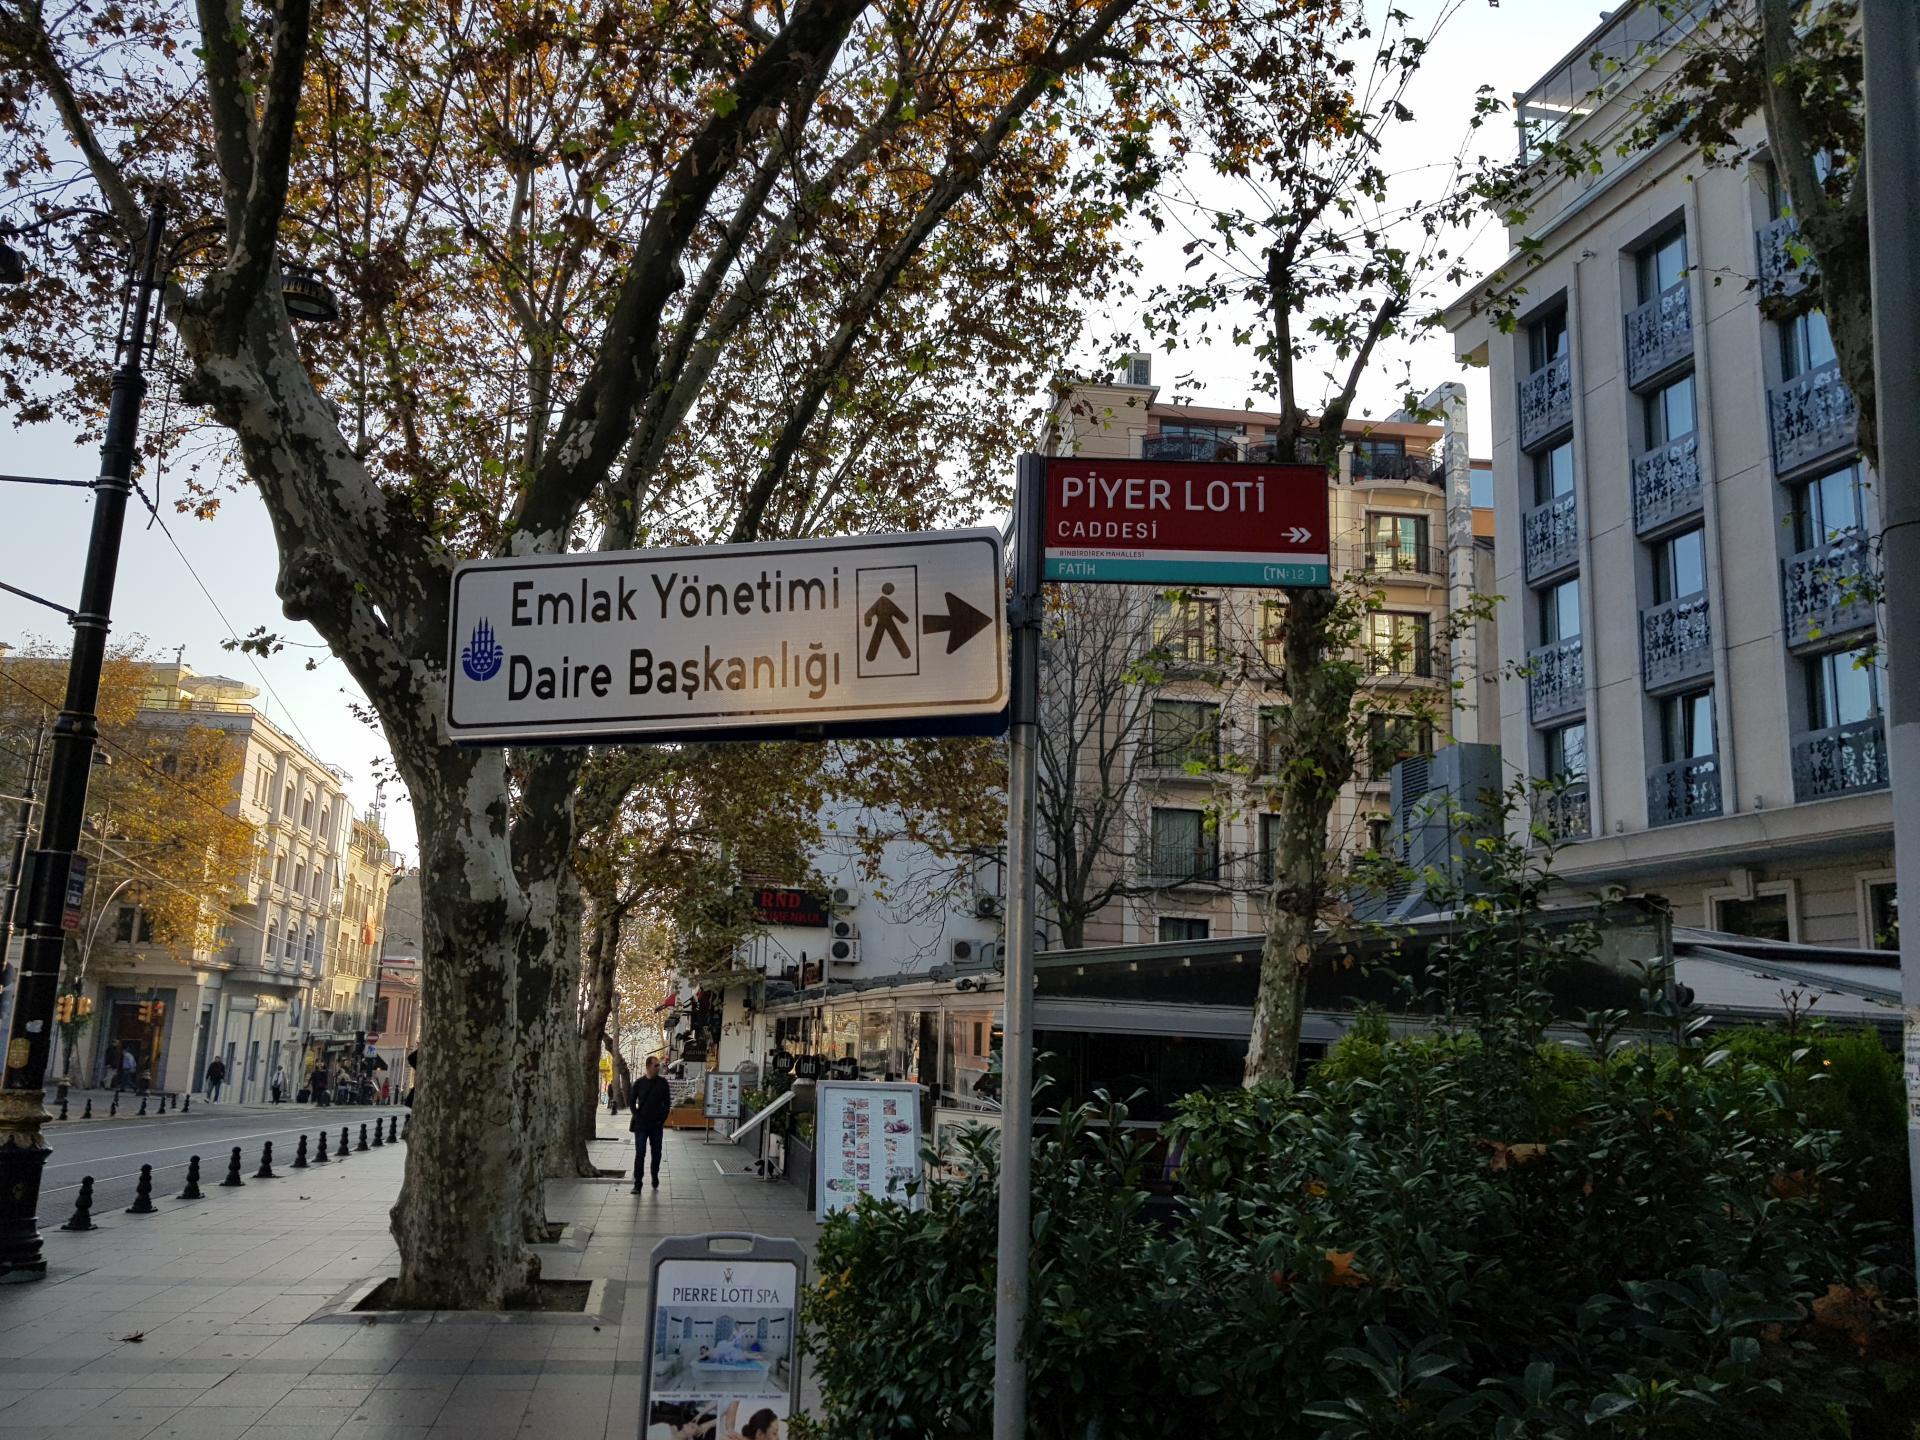 Улица Piyer Loti, Стамбул